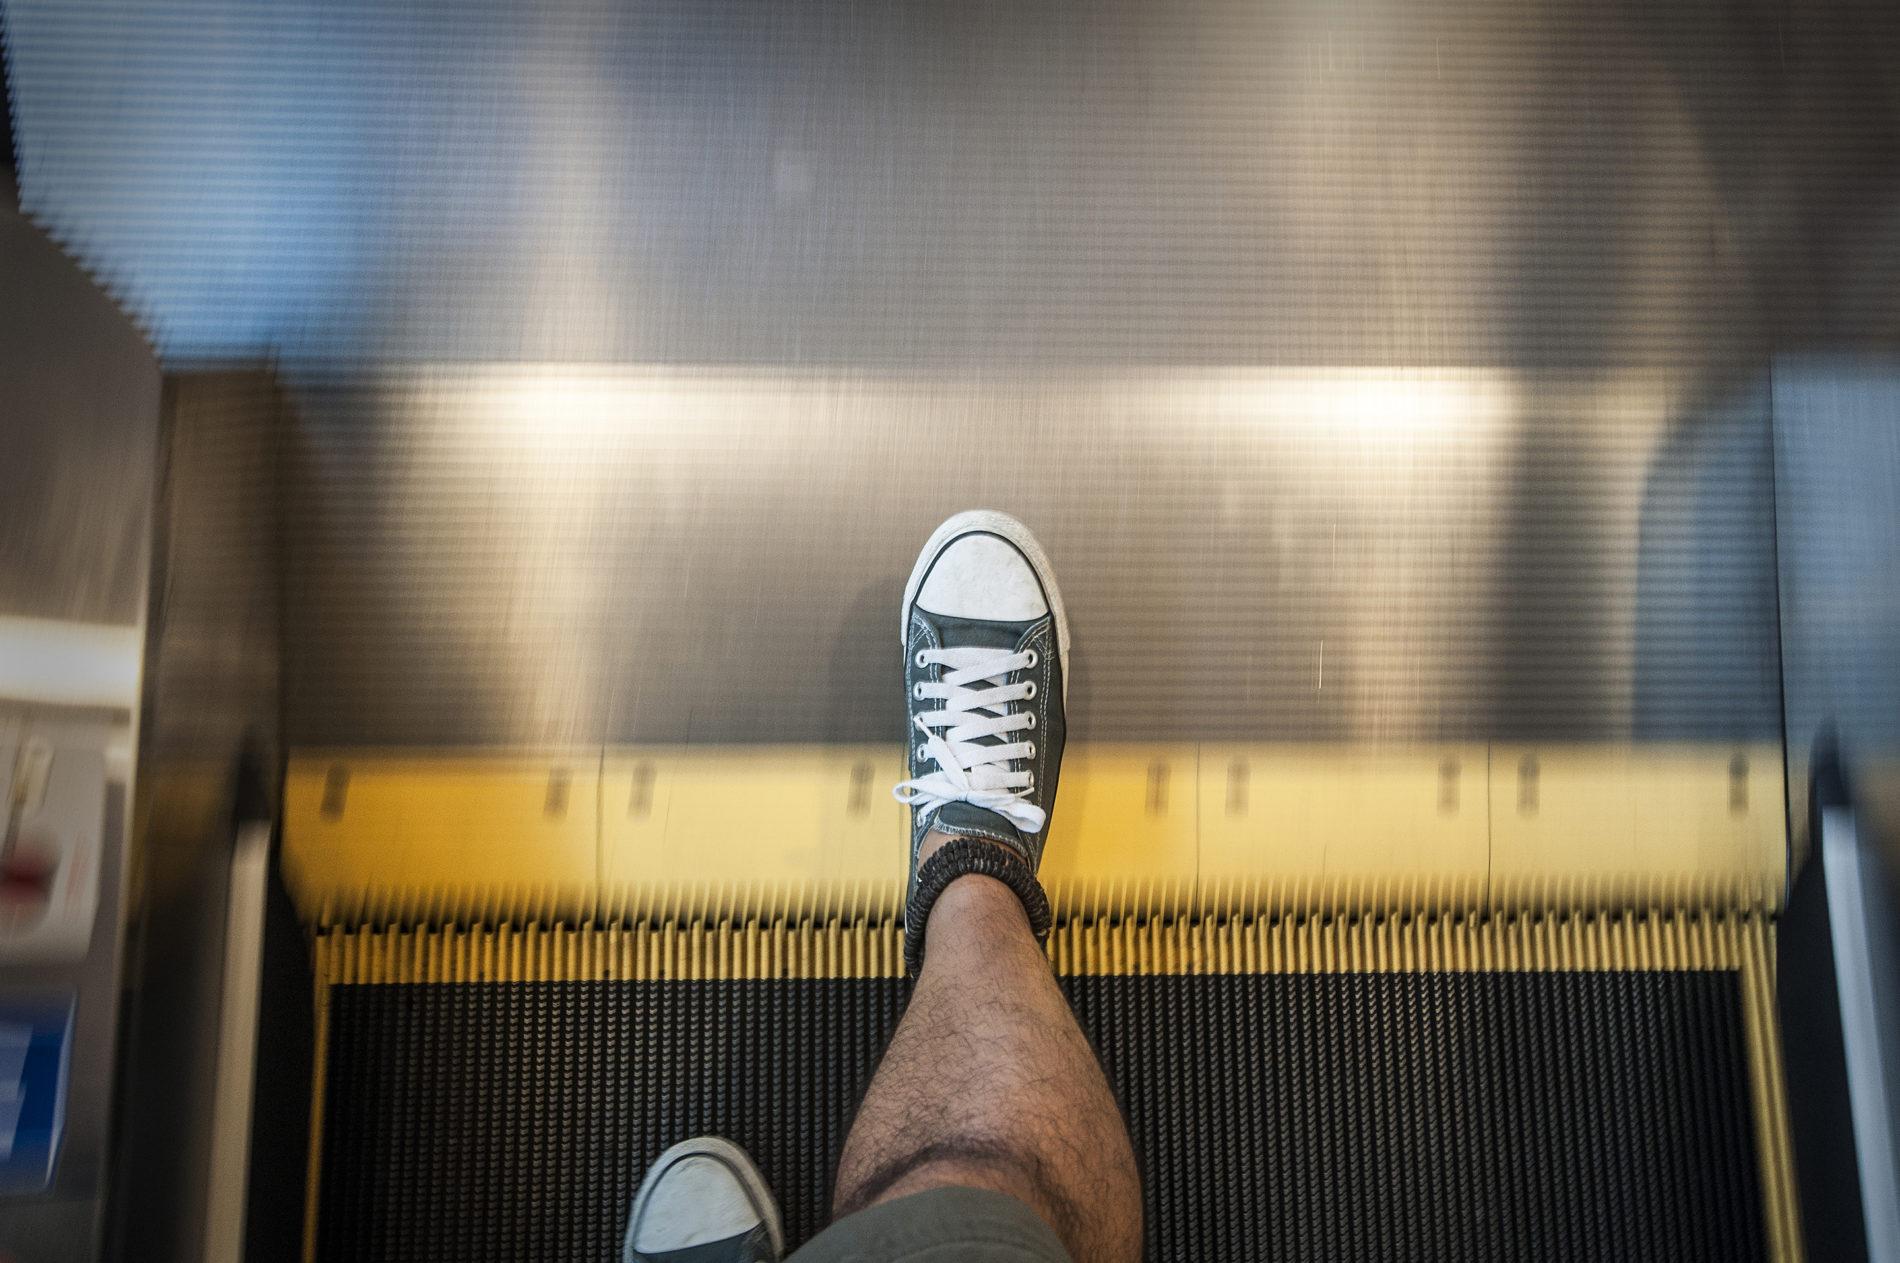 Get-On-and-Off-an-Escalator-Step-5-e1474505062905.jpg